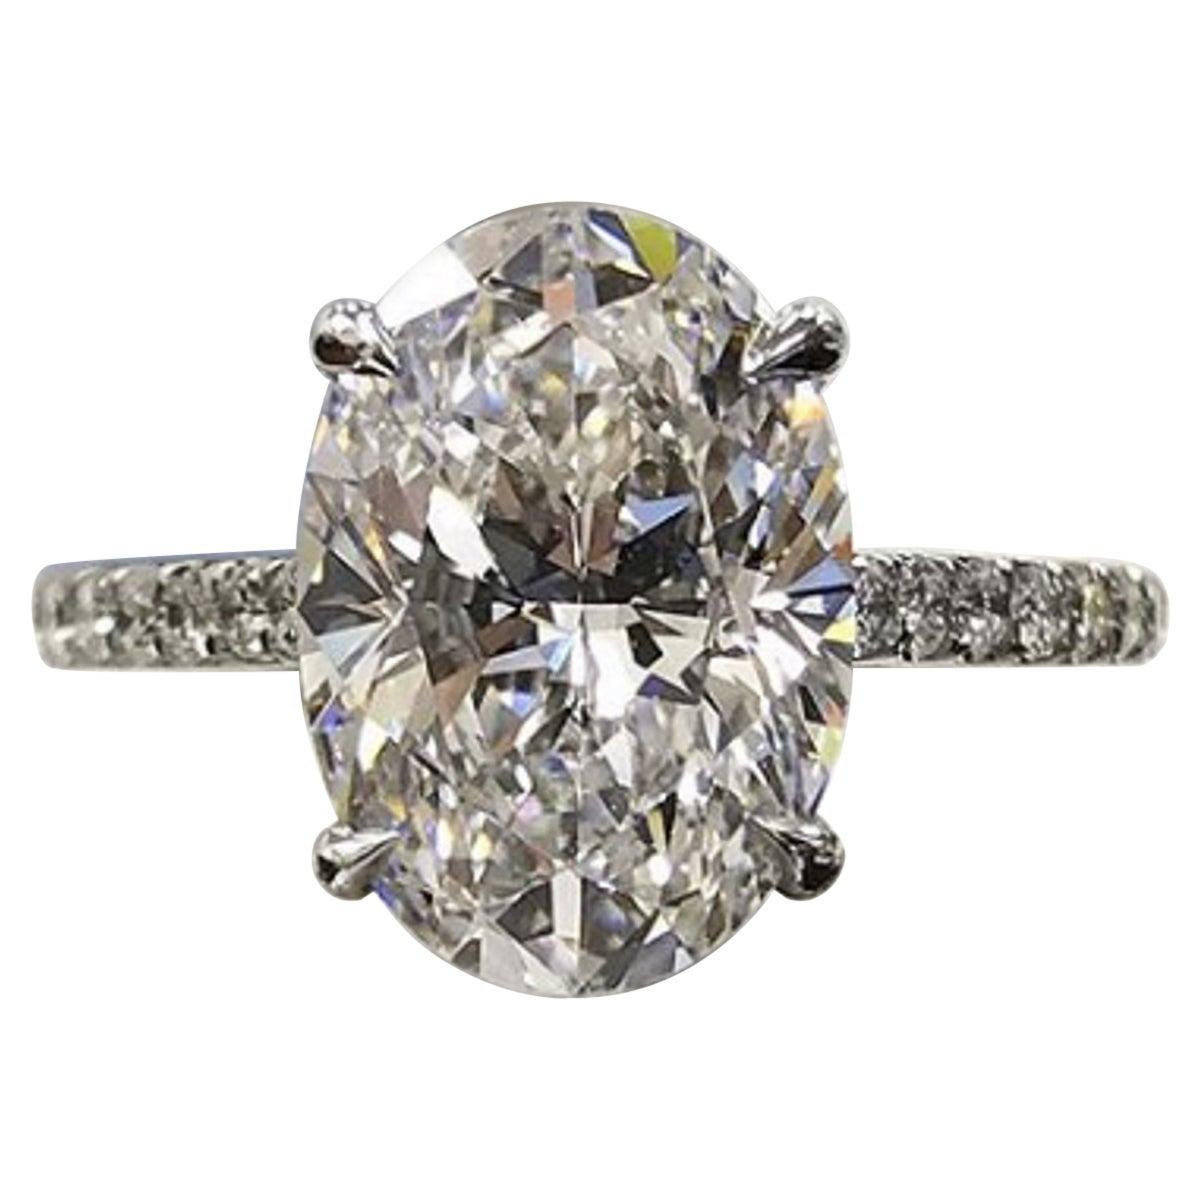 HRD Antwerp Certified 2.25 Carat G Oval Cut Diamond Eye Clean Engagement Ring